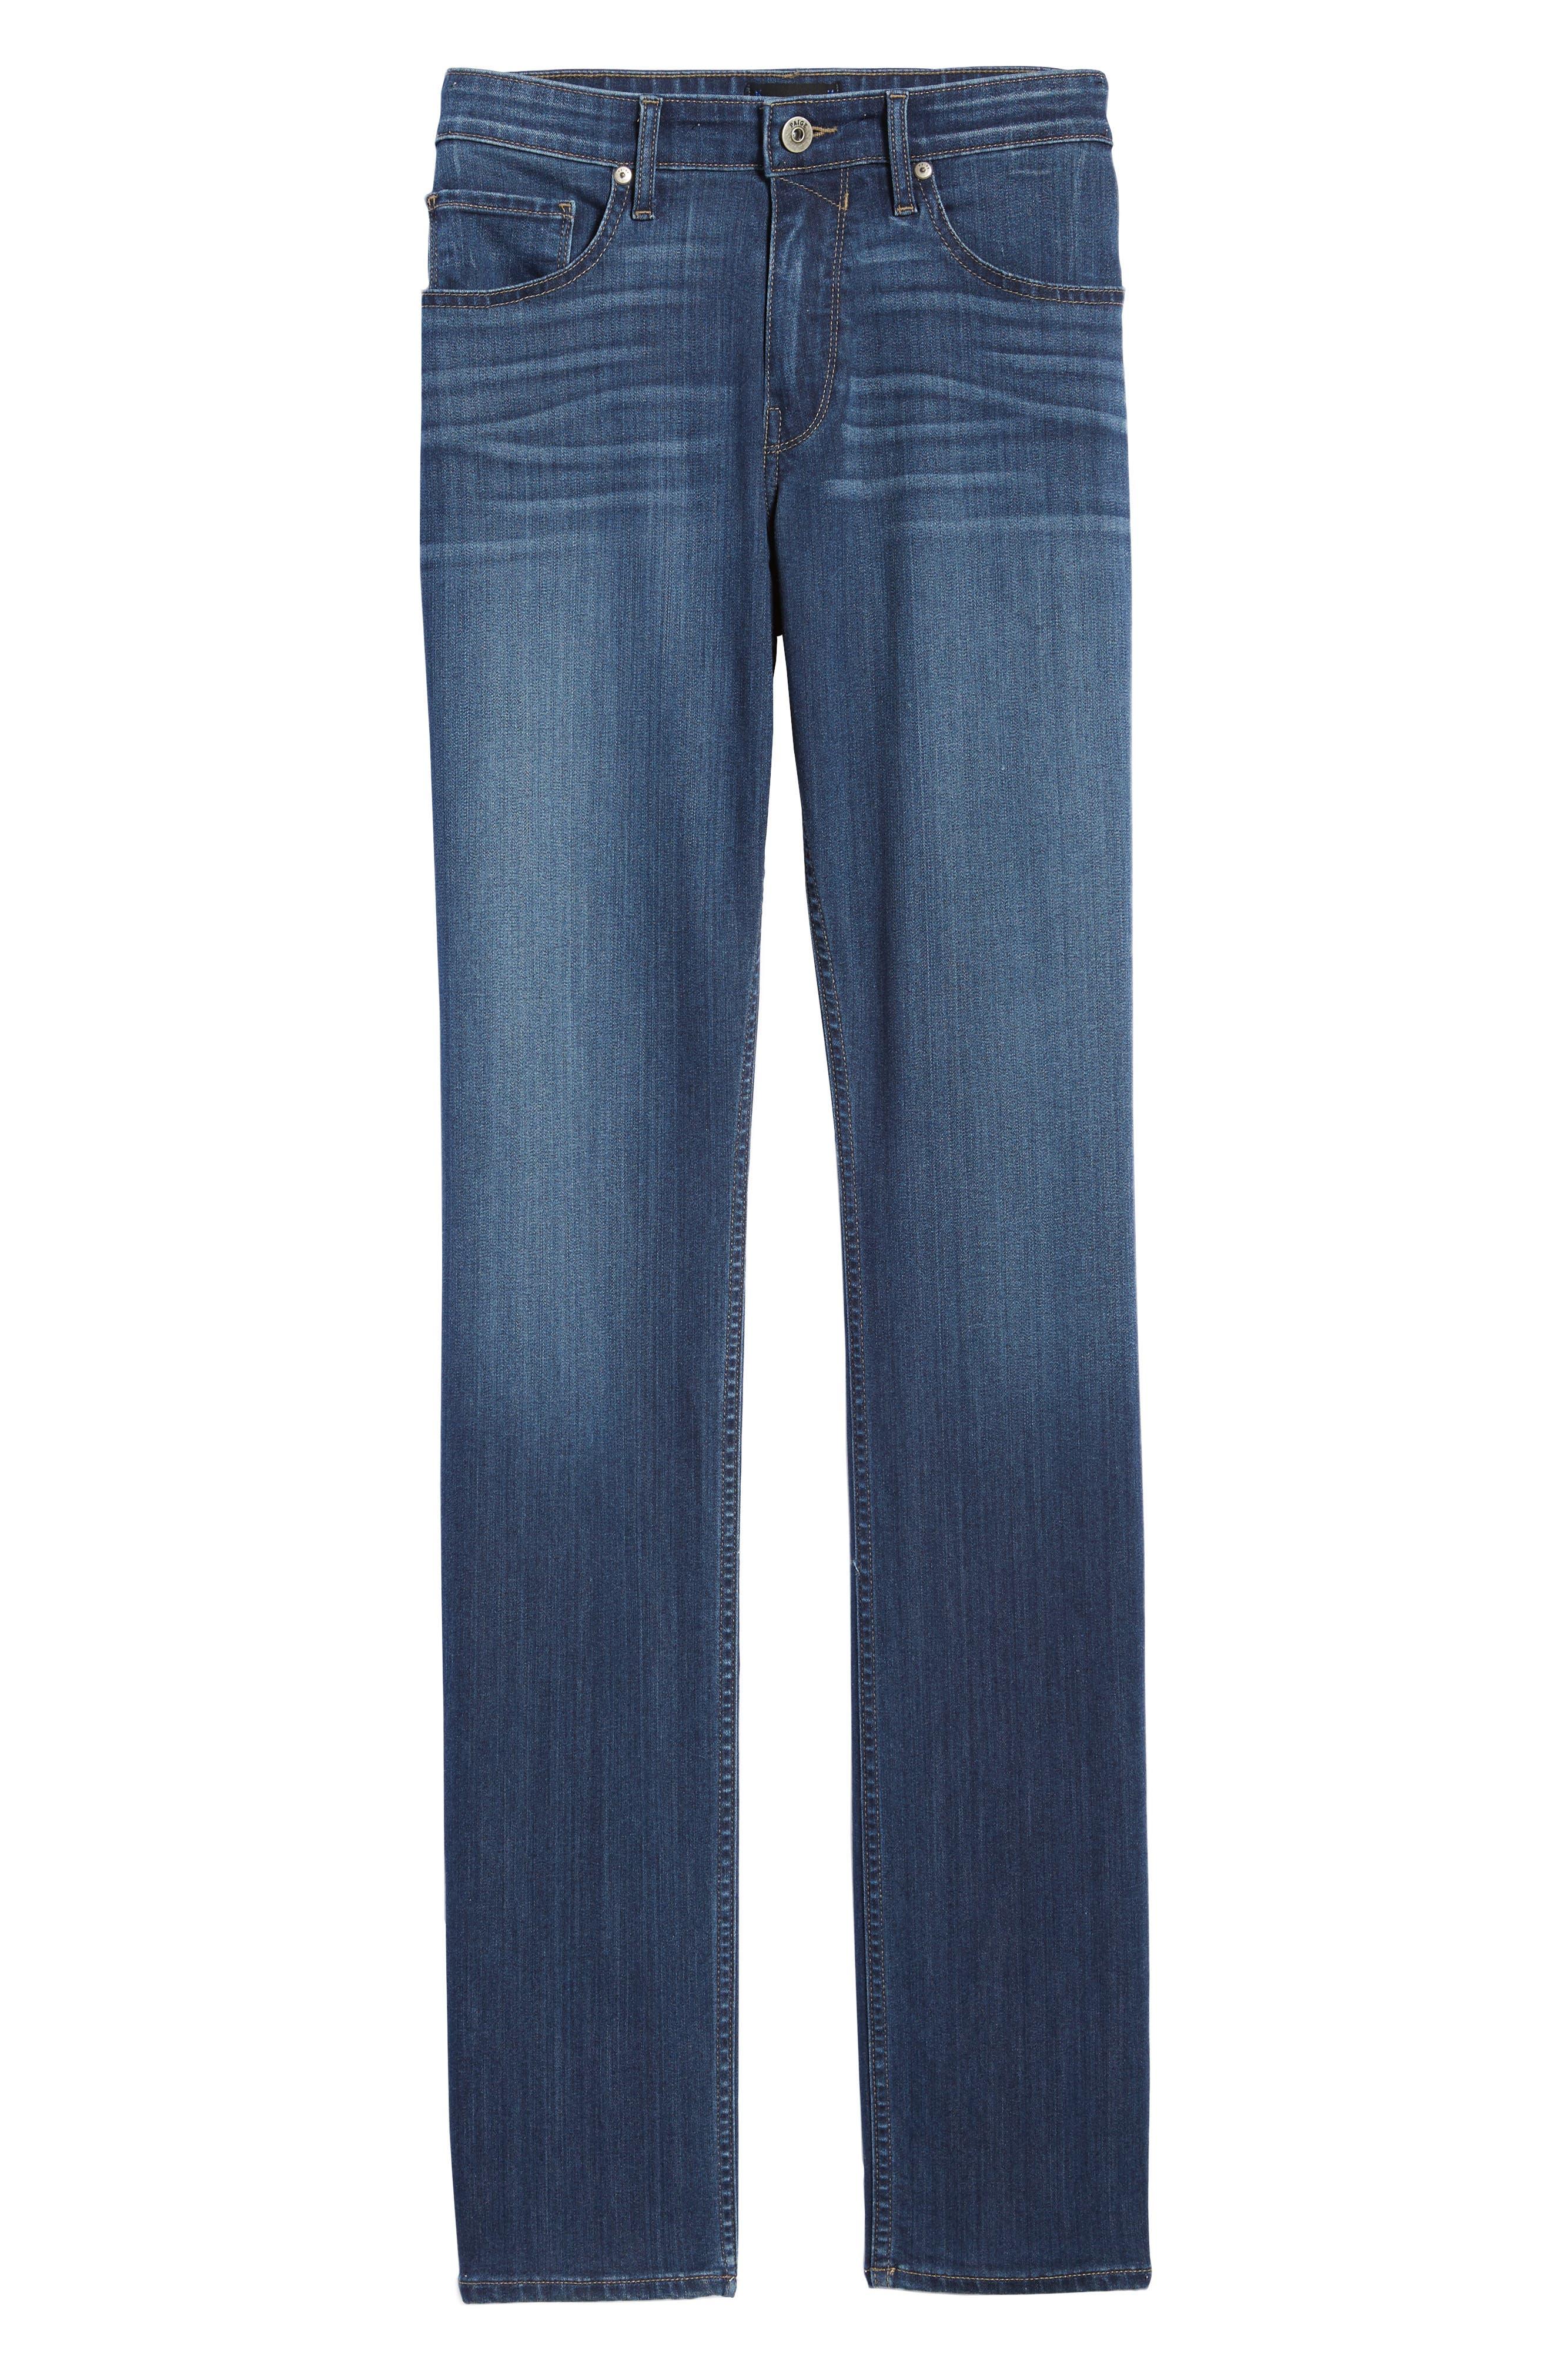 Transcend - Federal Slim Straight Leg Jeans,                             Alternate thumbnail 6, color,